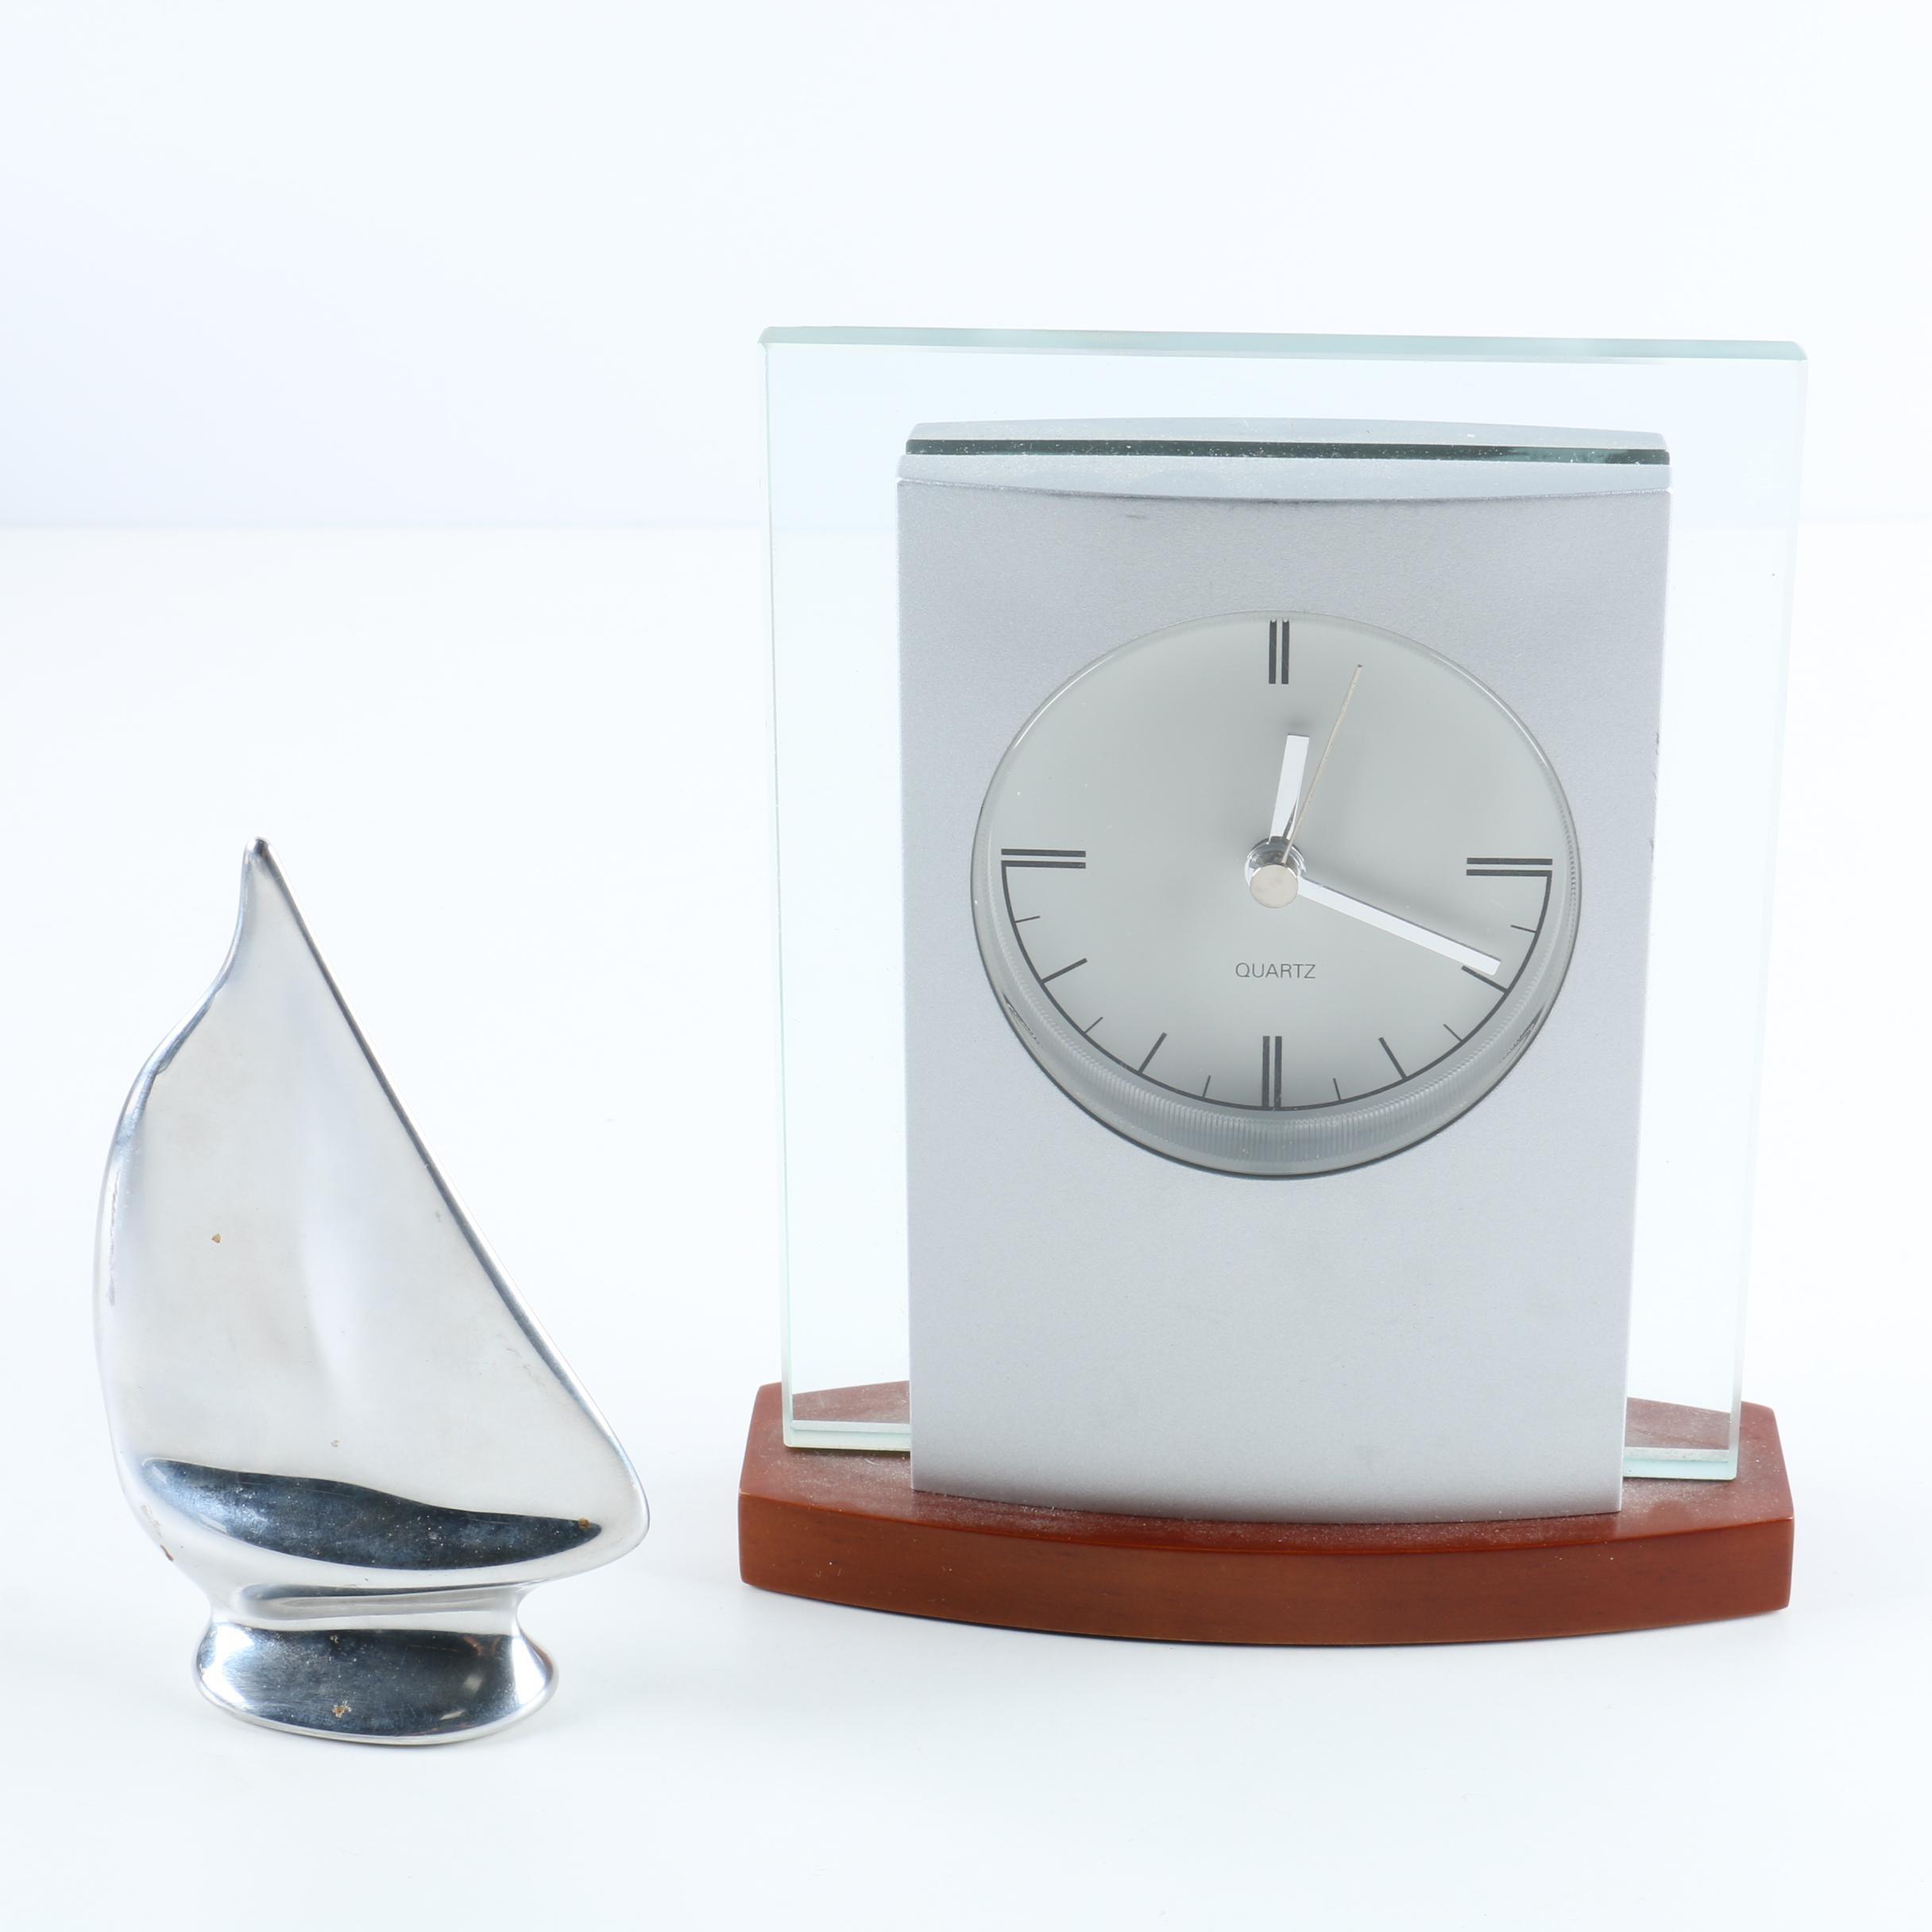 Hoselton Silver Plate Sail Boat Sculpture and Bulova Desk Clock